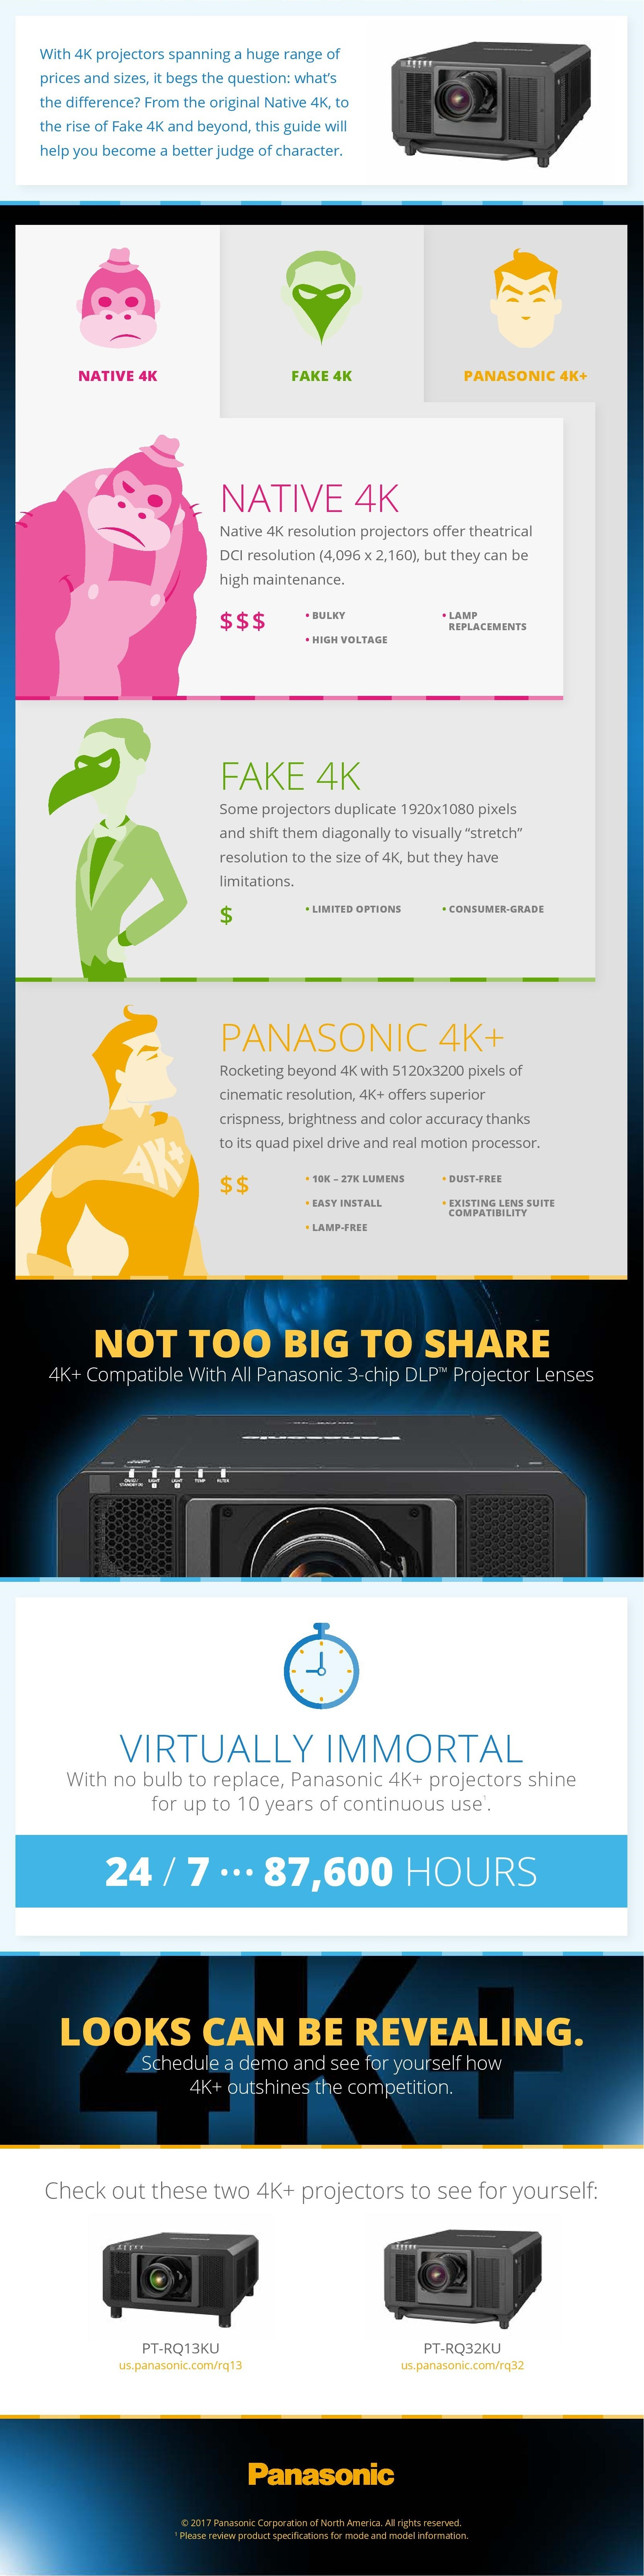 4KPlus_Infographic-page-001.jpg